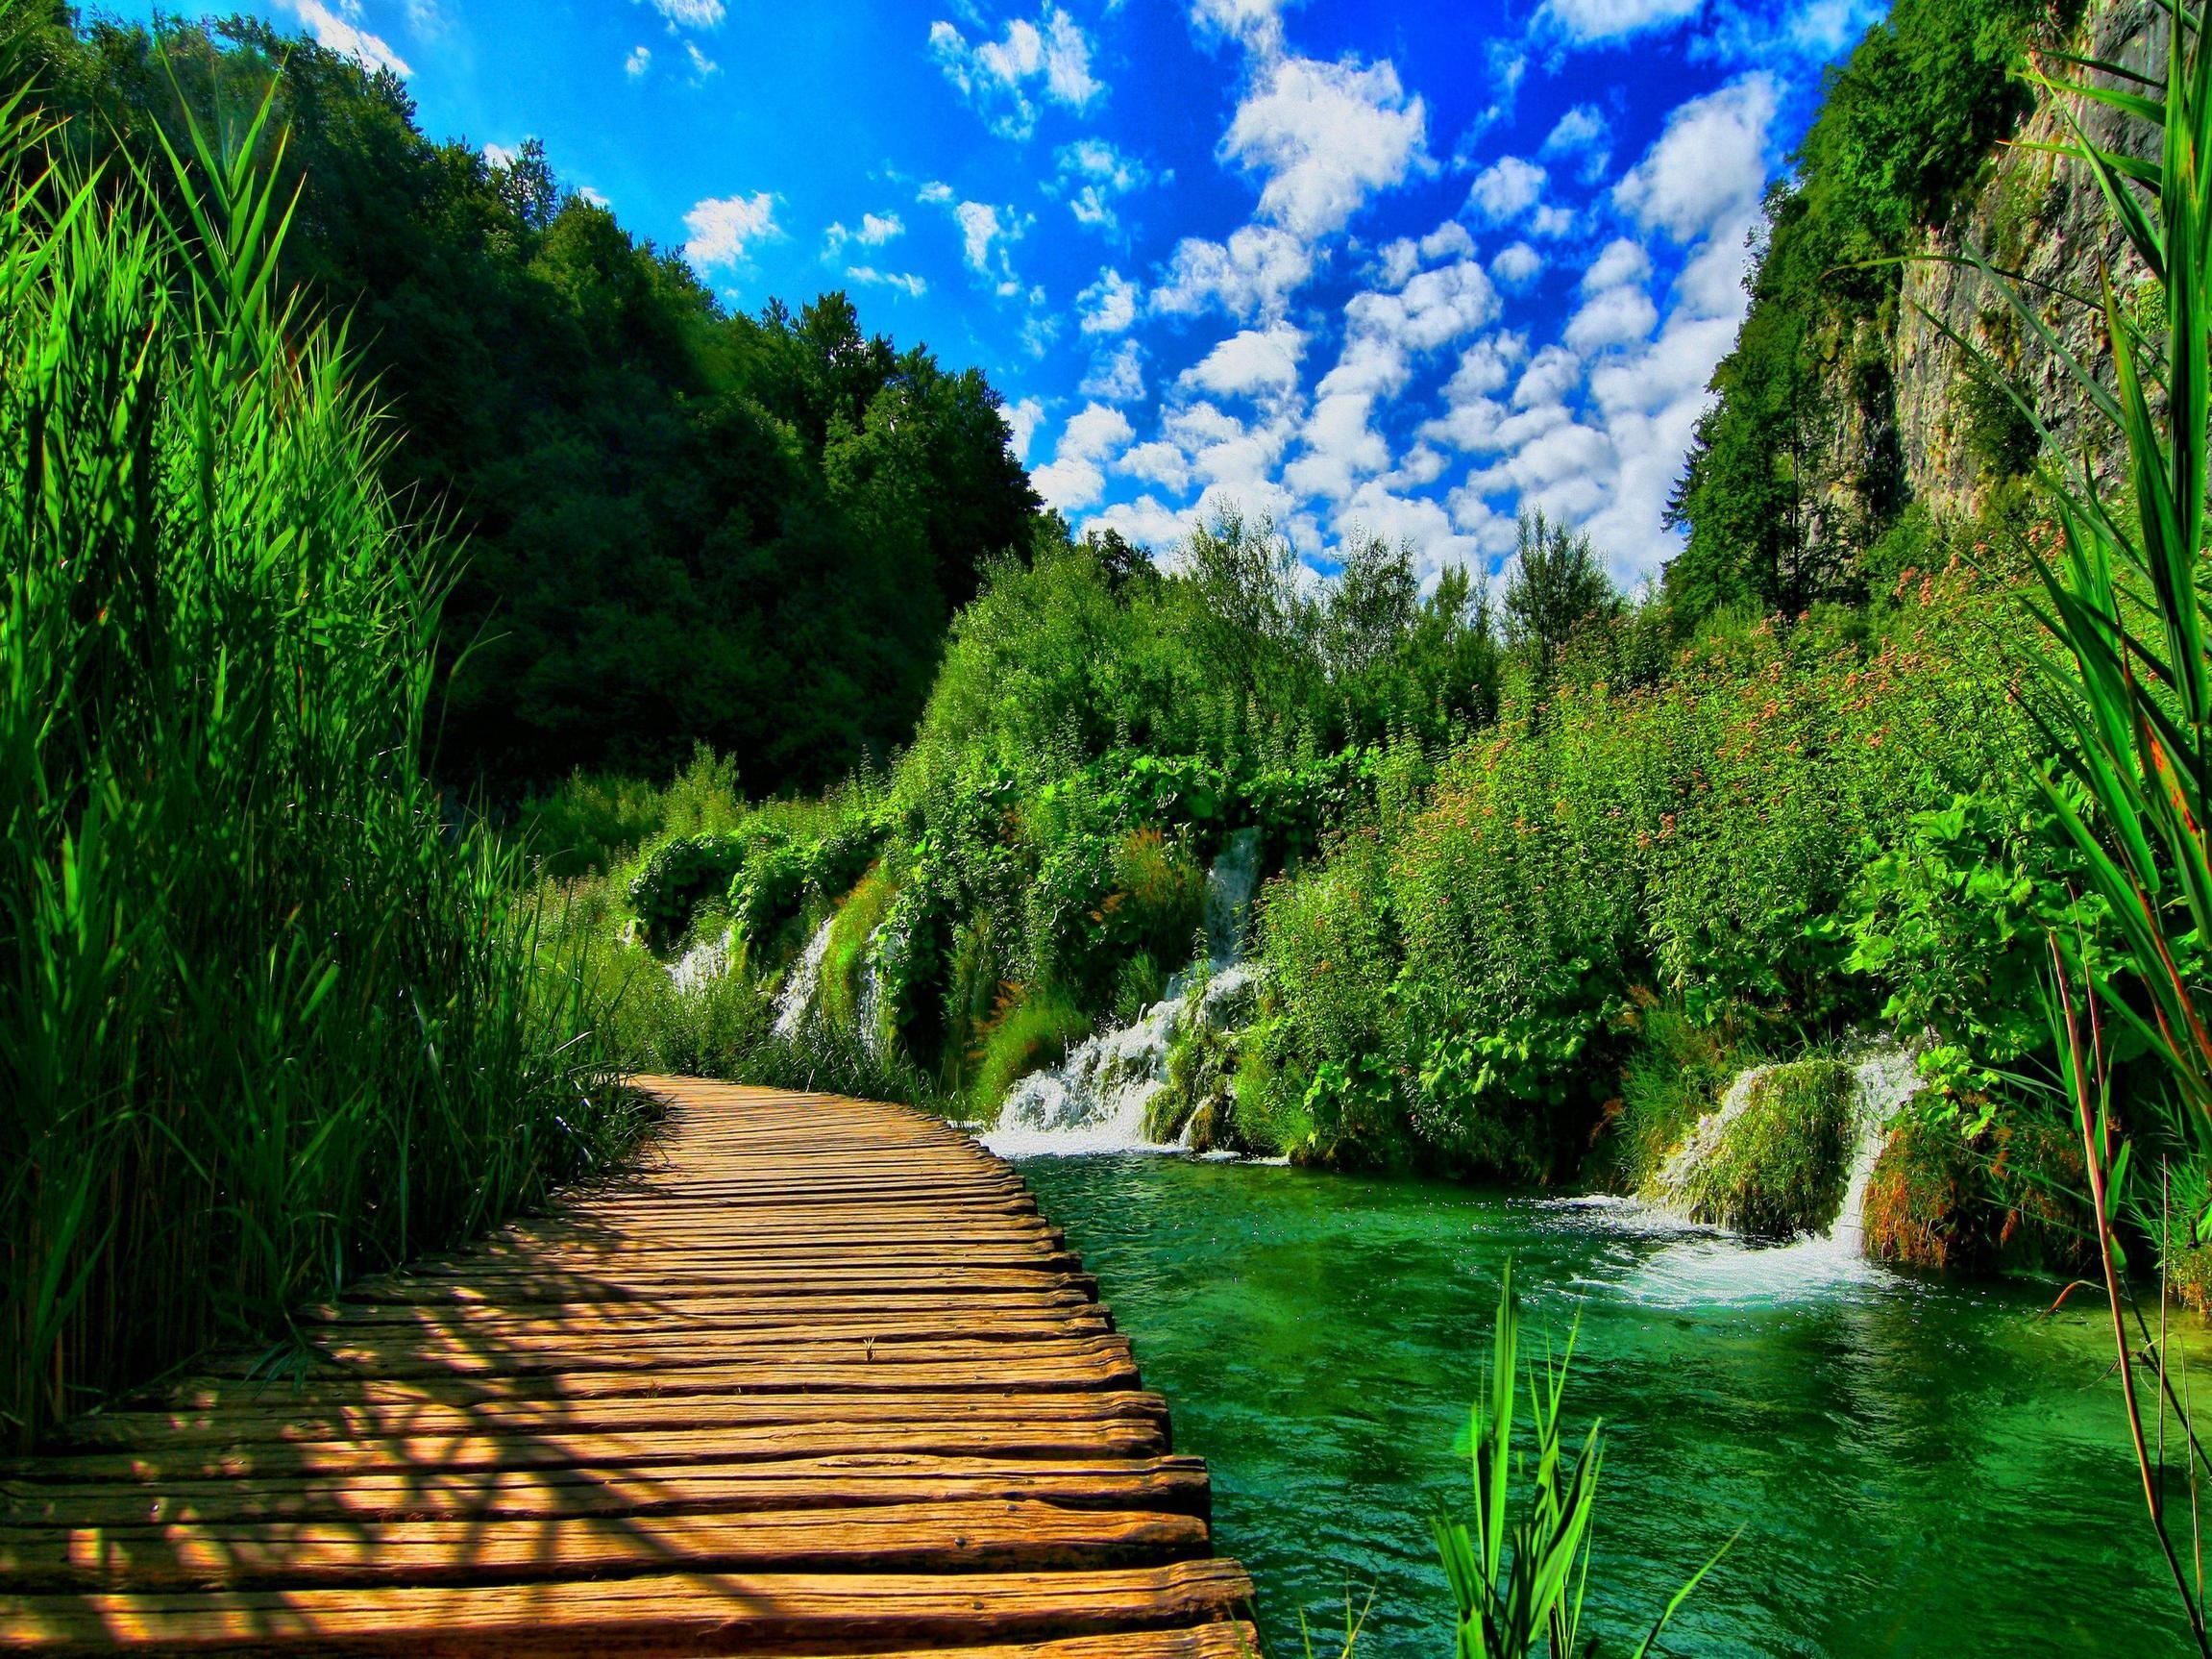 nature pictures for desktop background (65+ images)